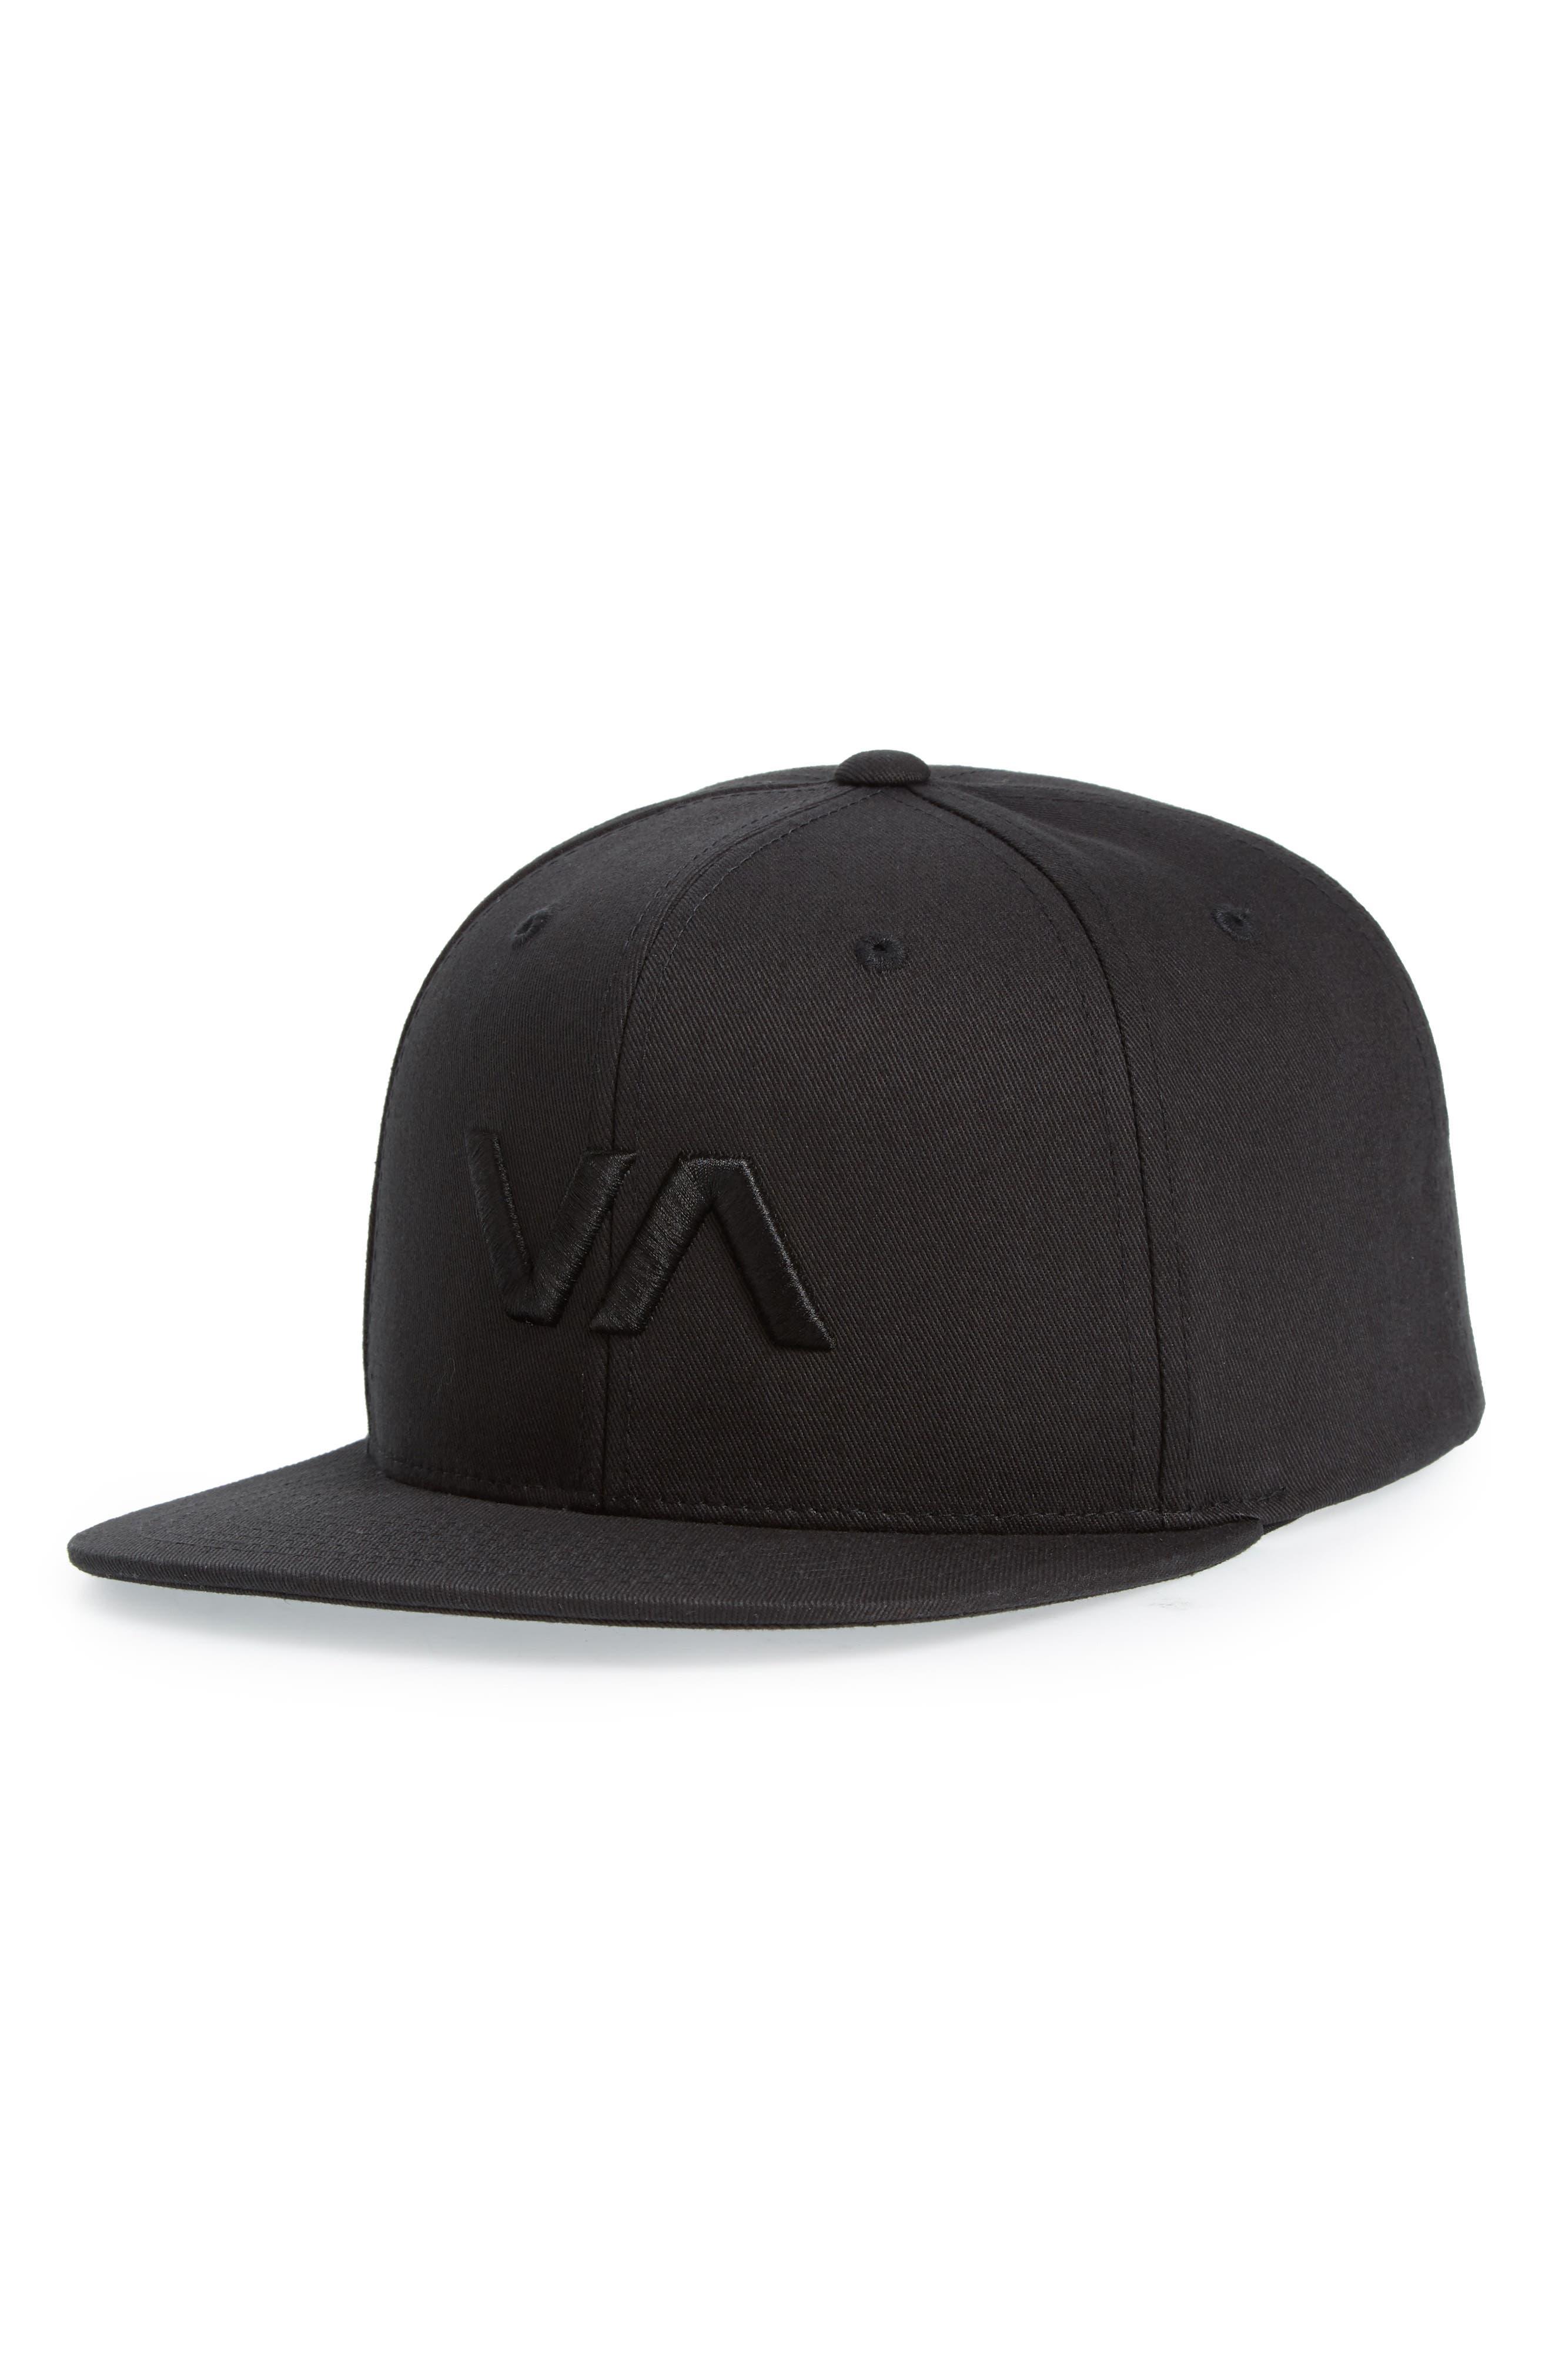 VA Snapback II Snapback Hat,                         Main,                         color, BLACK/ BLACK